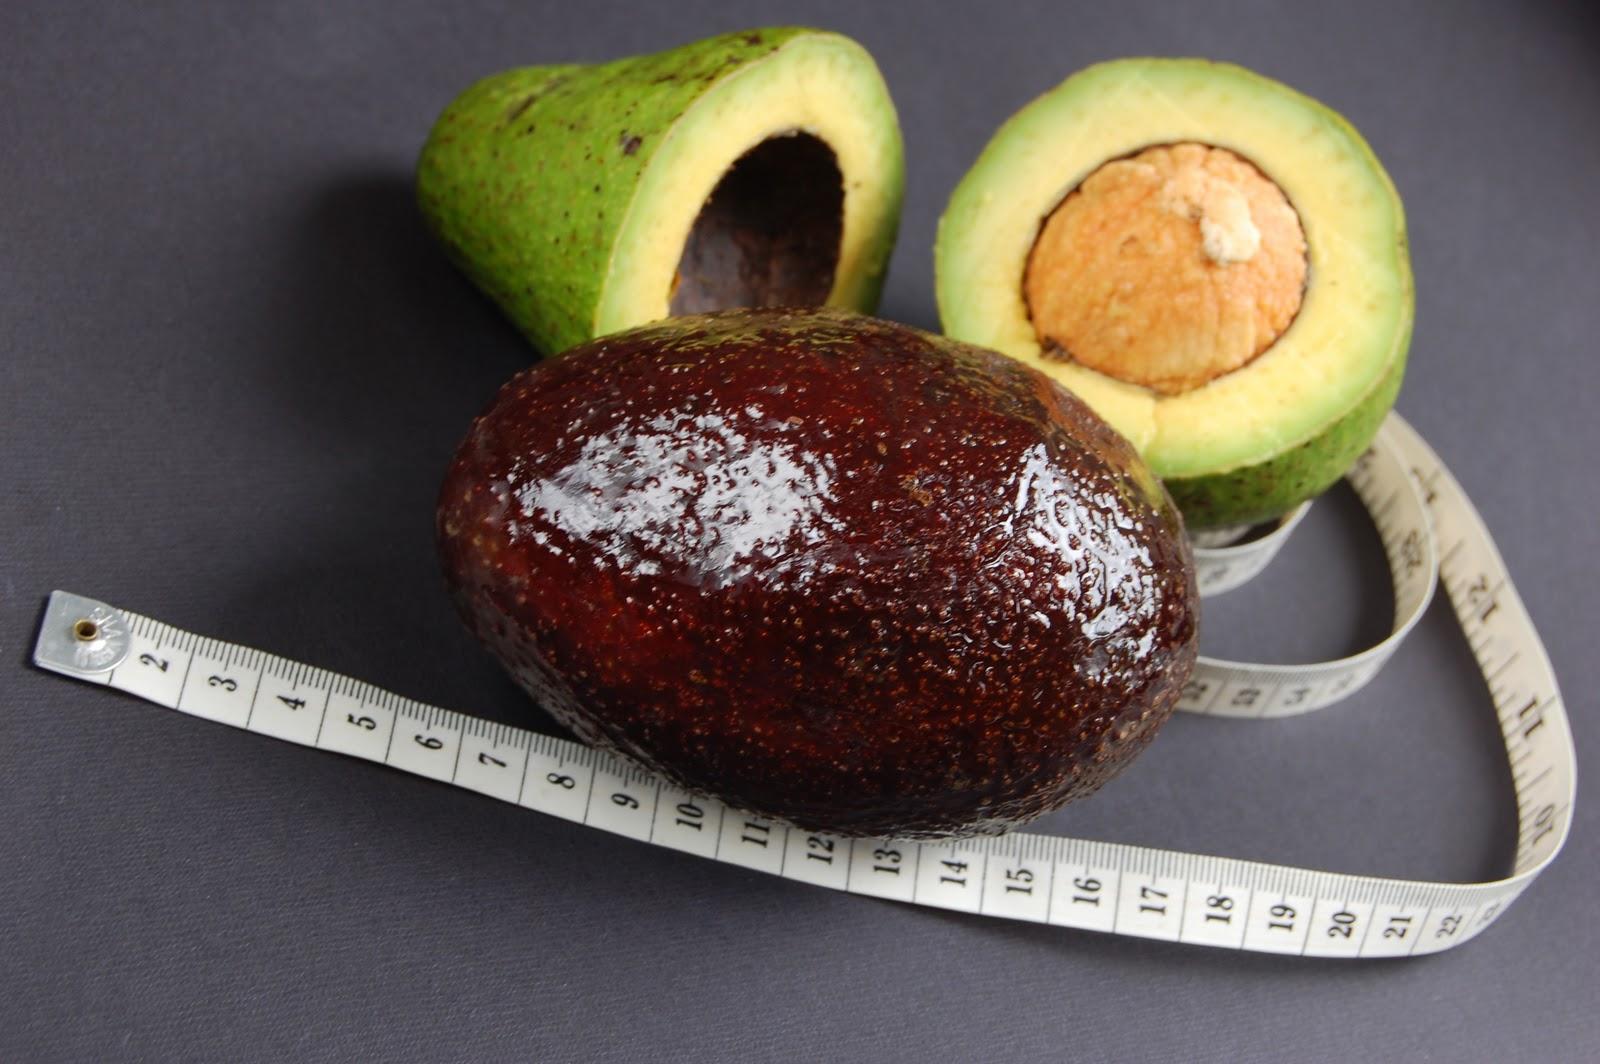 Avocado And Fat 91